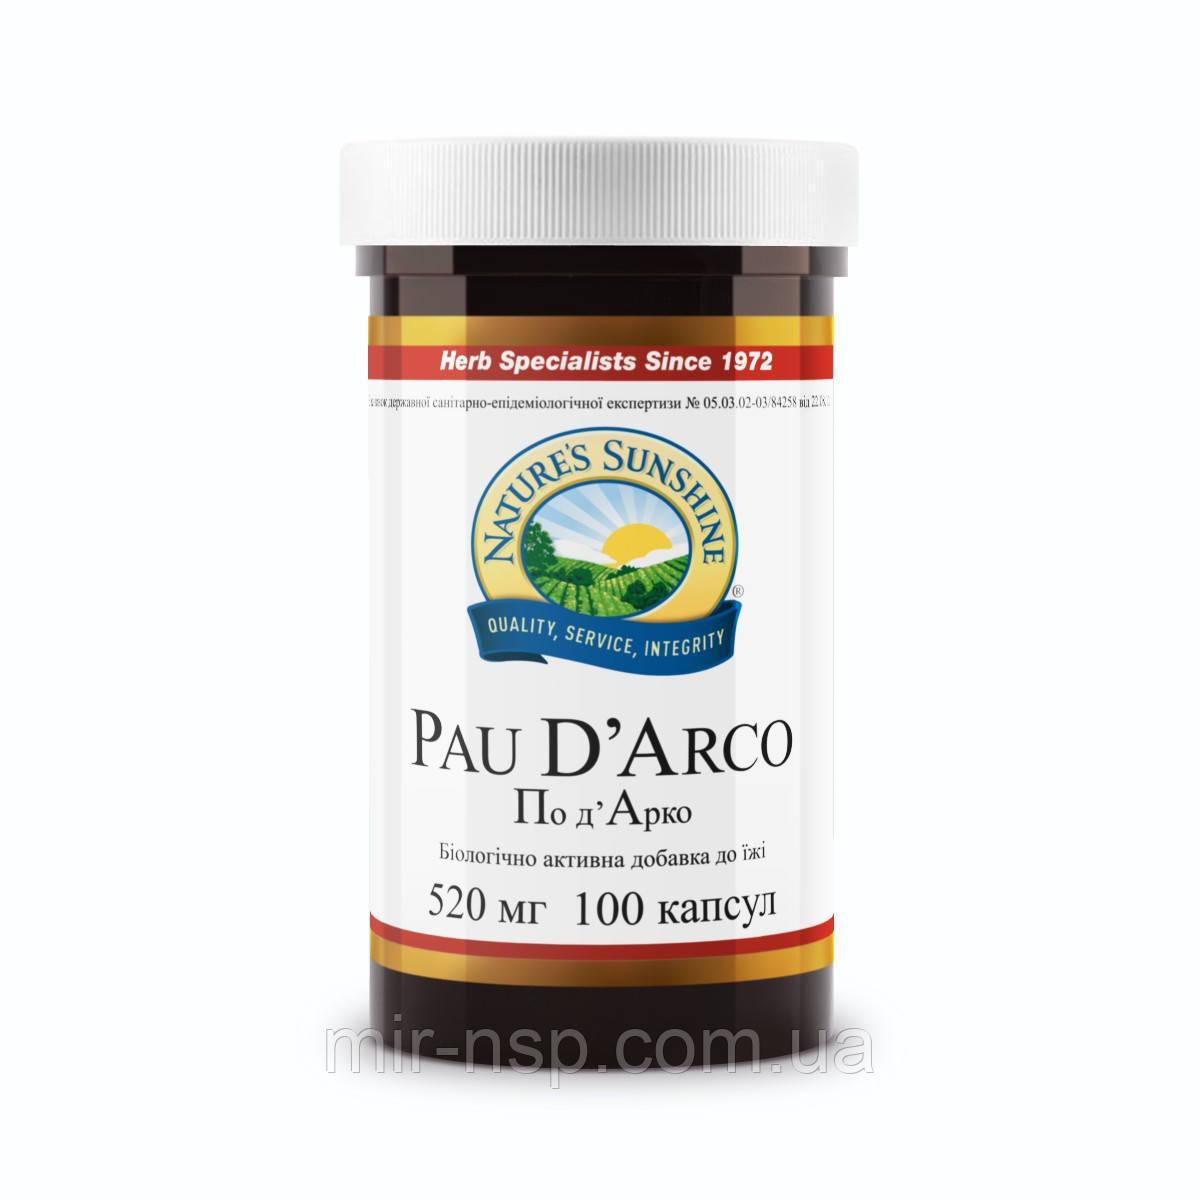 По д'Арко (подарко, пау дарко, пау д'арко, кора муравьиного дерева, pau d'arco) бад НСП